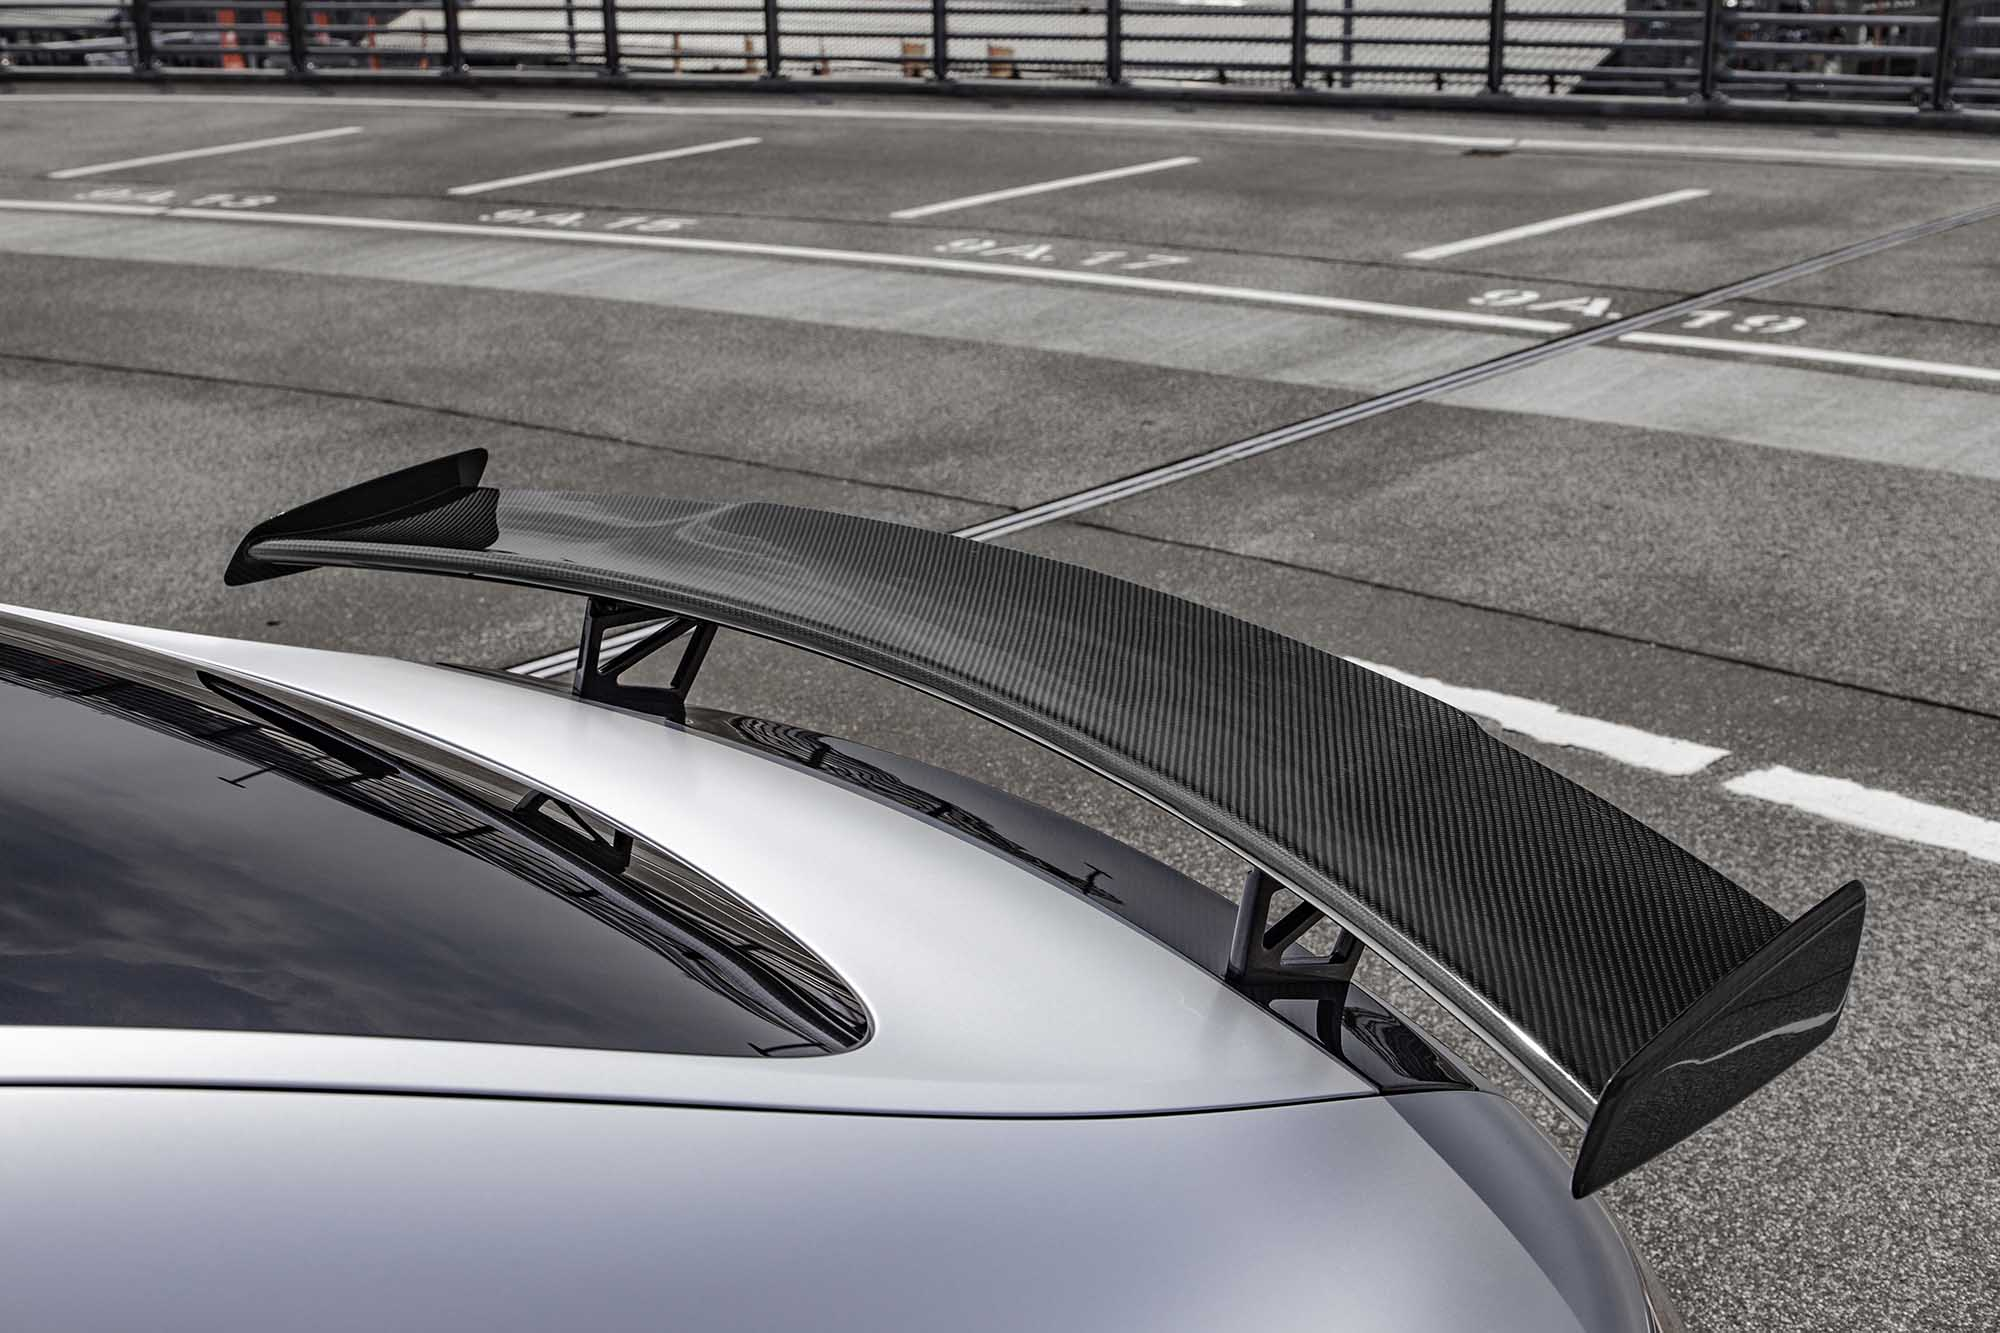 Mercedes AMG GT Luethen